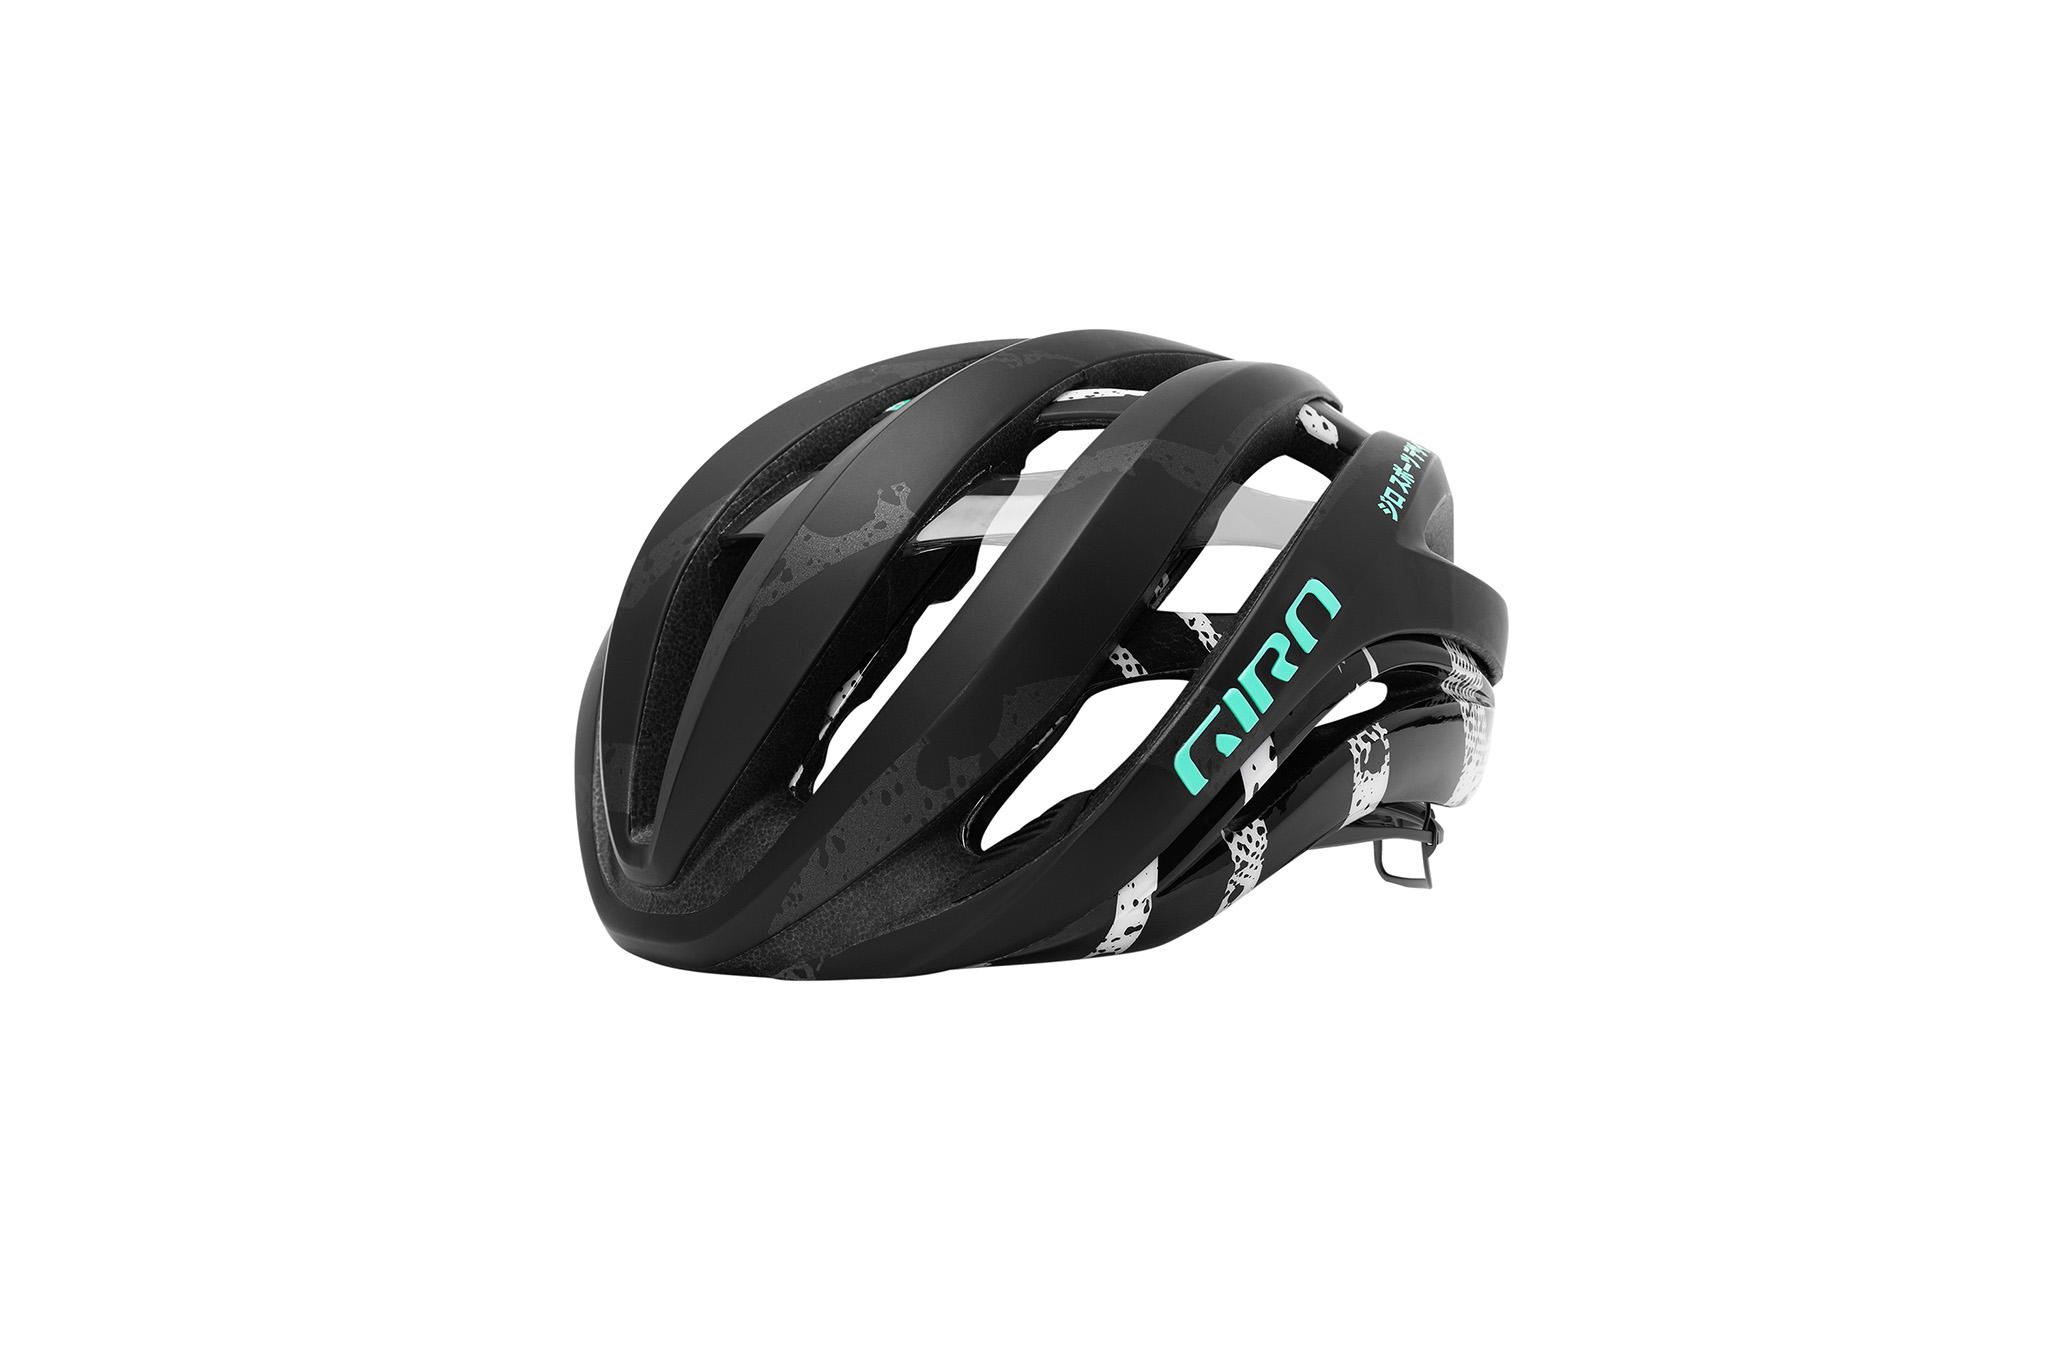 GIRO X YASUDA หมวกจักรยานรุ่น AETHER MIPS